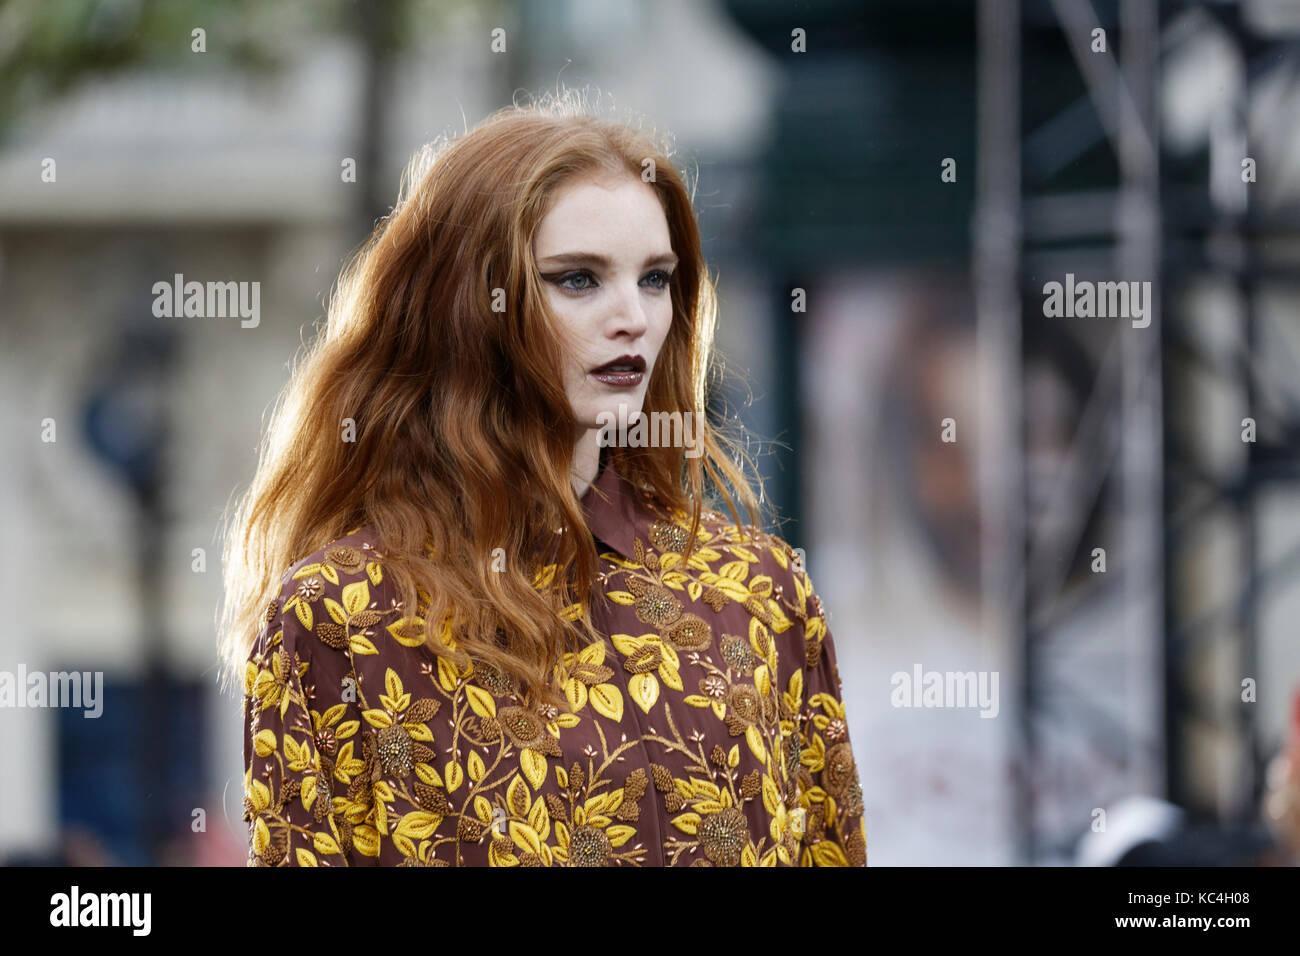 2019 Alexina Graham naked (43 photos), Sexy, Fappening, Selfie, bra 2015